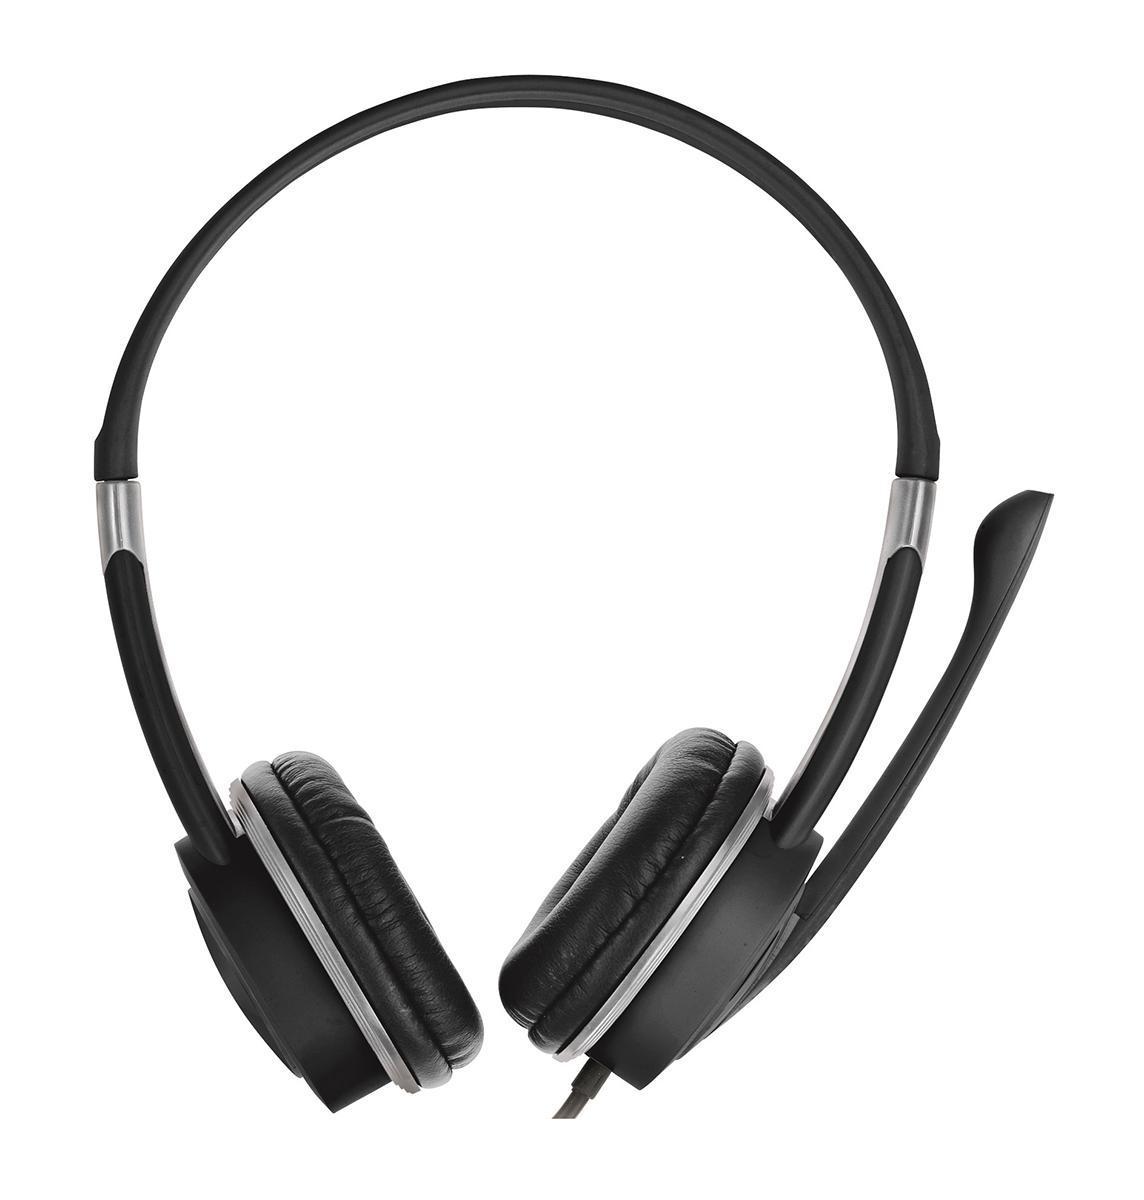 все цены на Trust Mauro USB Headset стереогарнитура онлайн